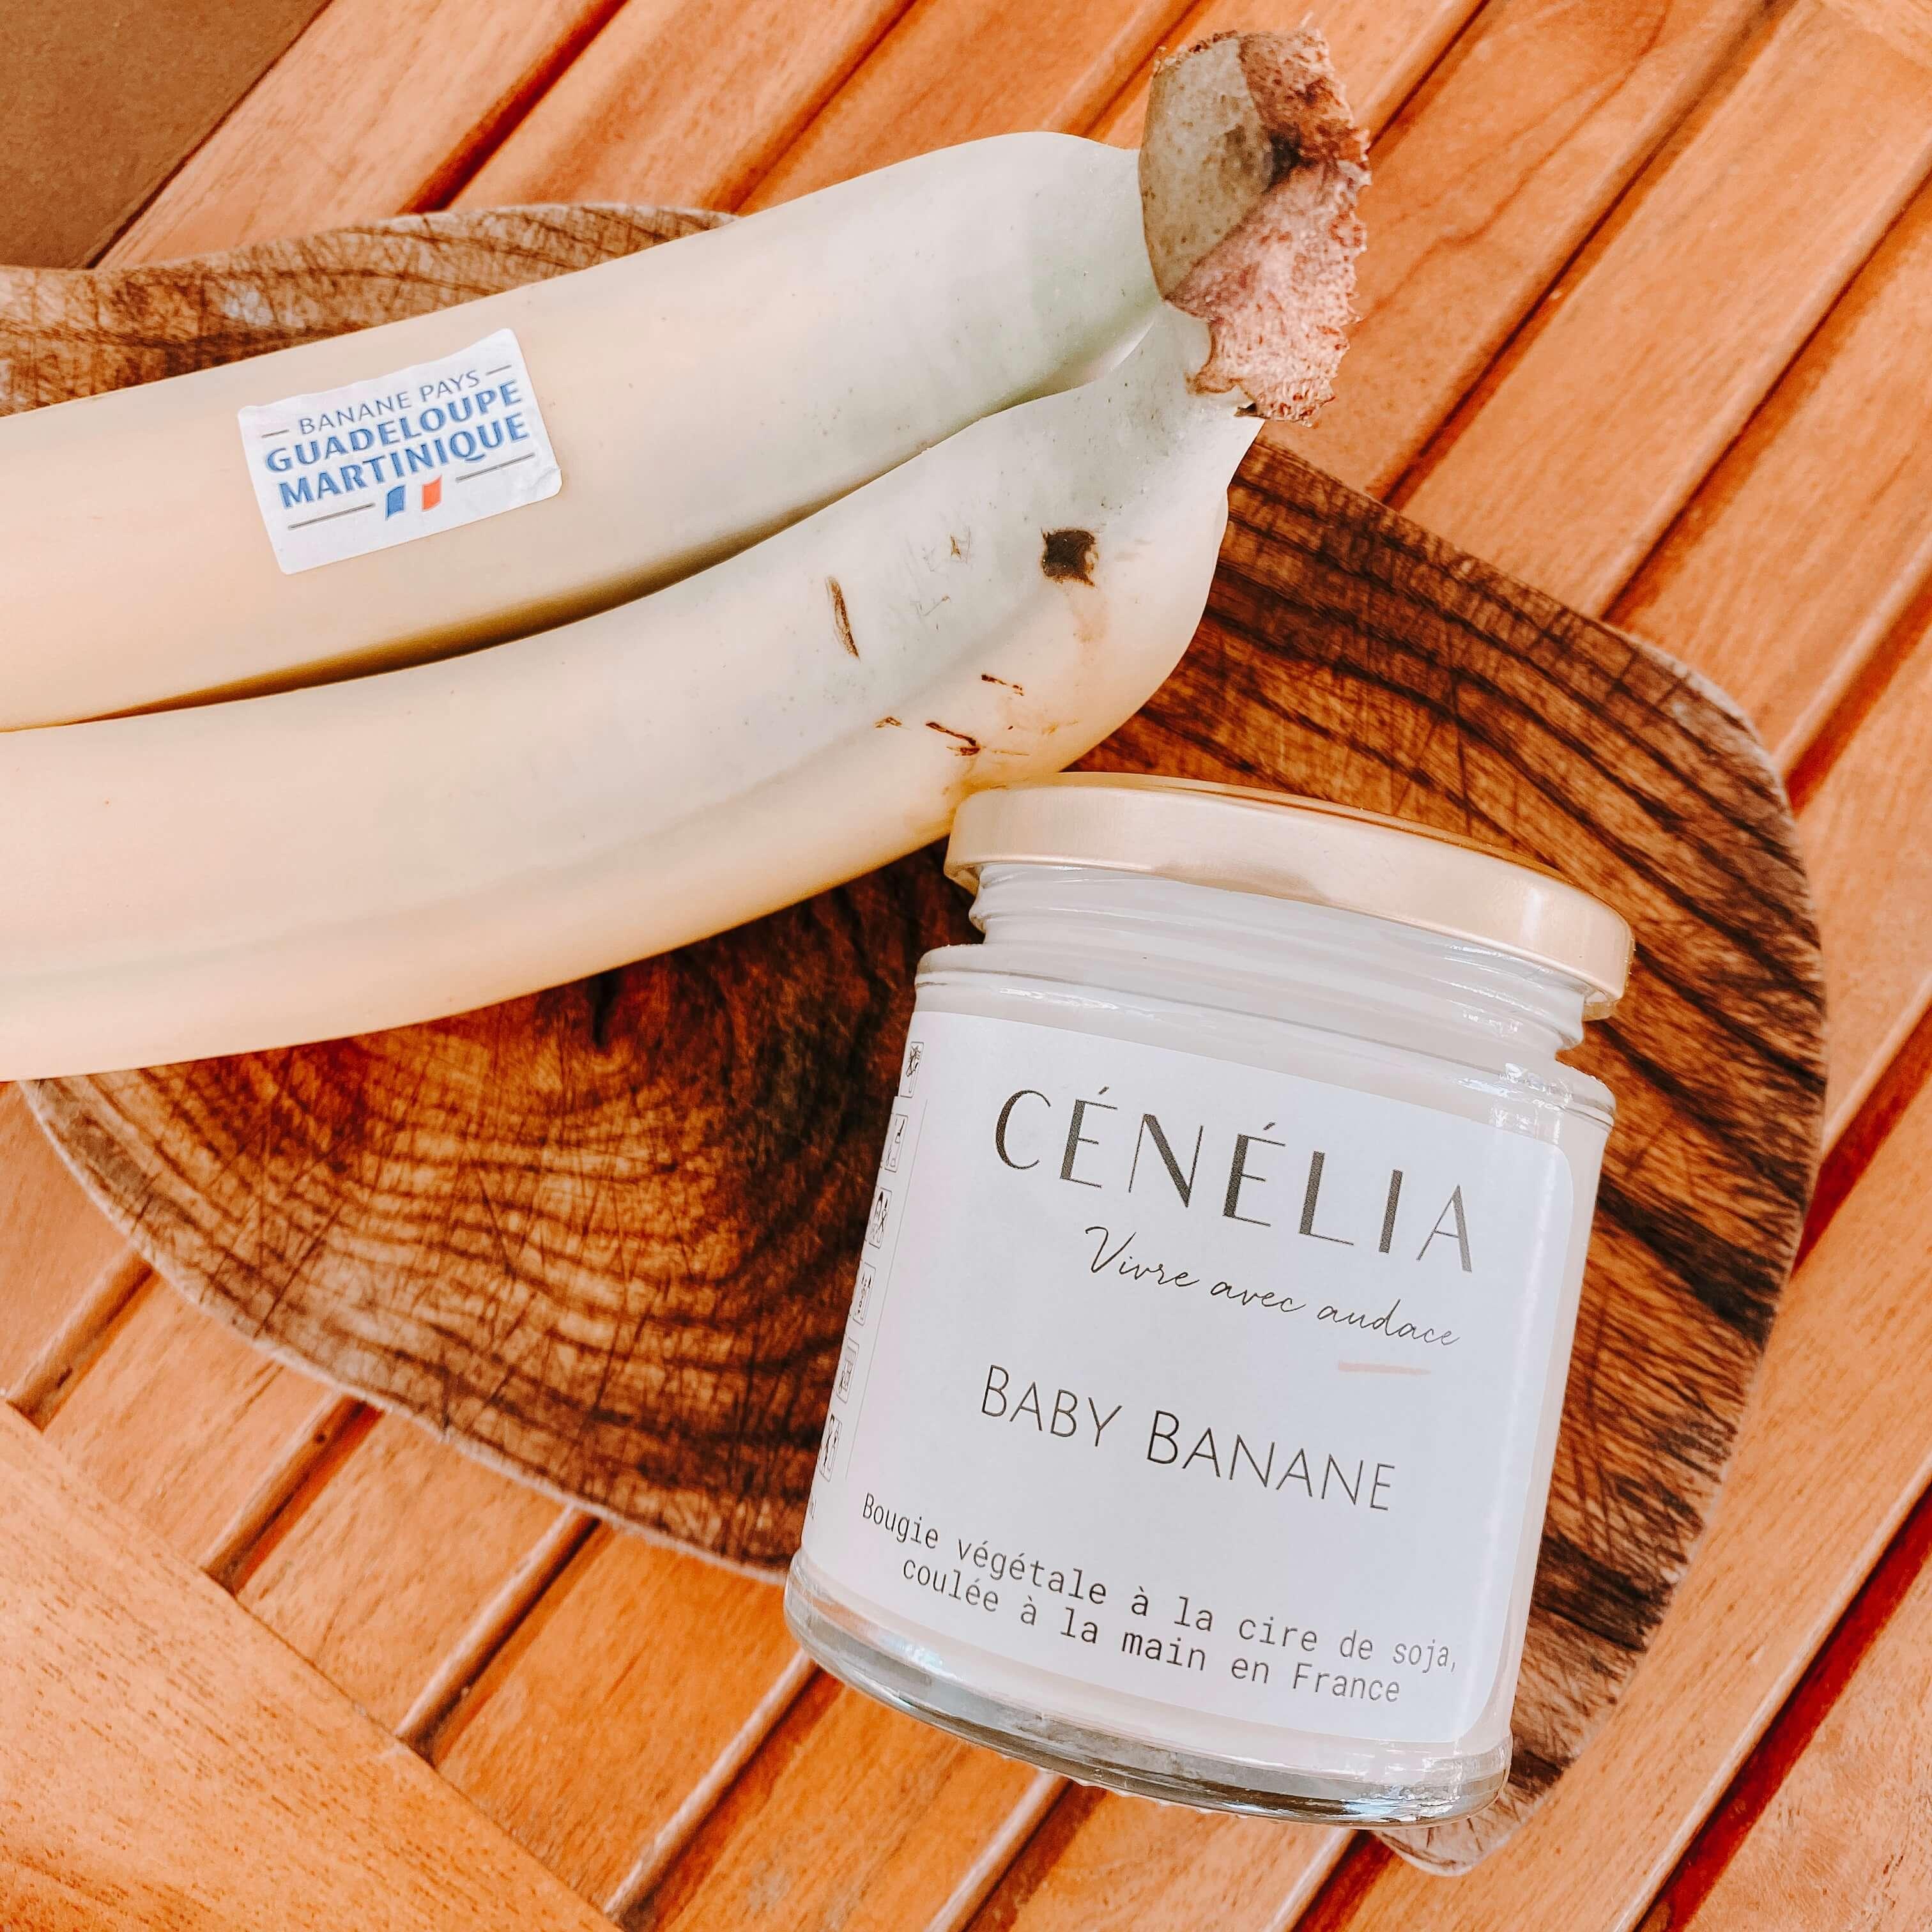 Bougie des îles - Bougie Cénélia Baby Banane